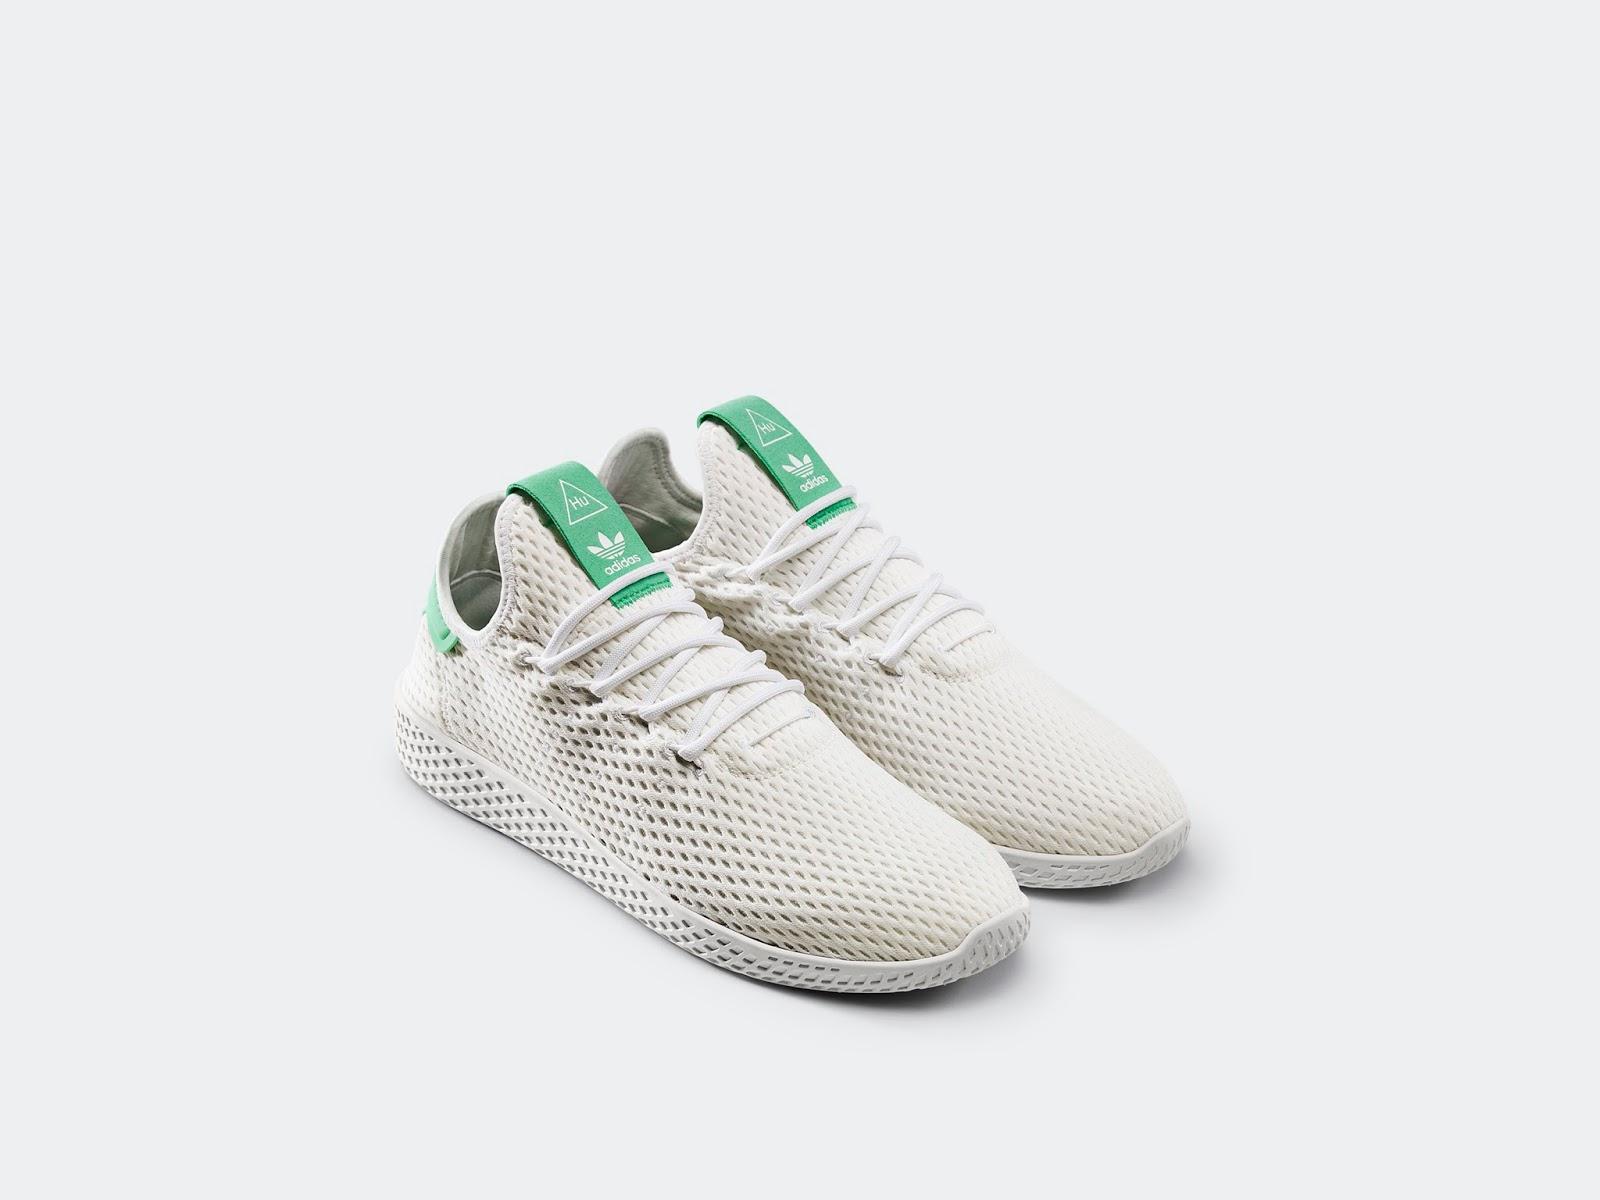 c83b1ad82bd1f Manila Life  Adidas Originals   Pharrell Williams   Stan Smith